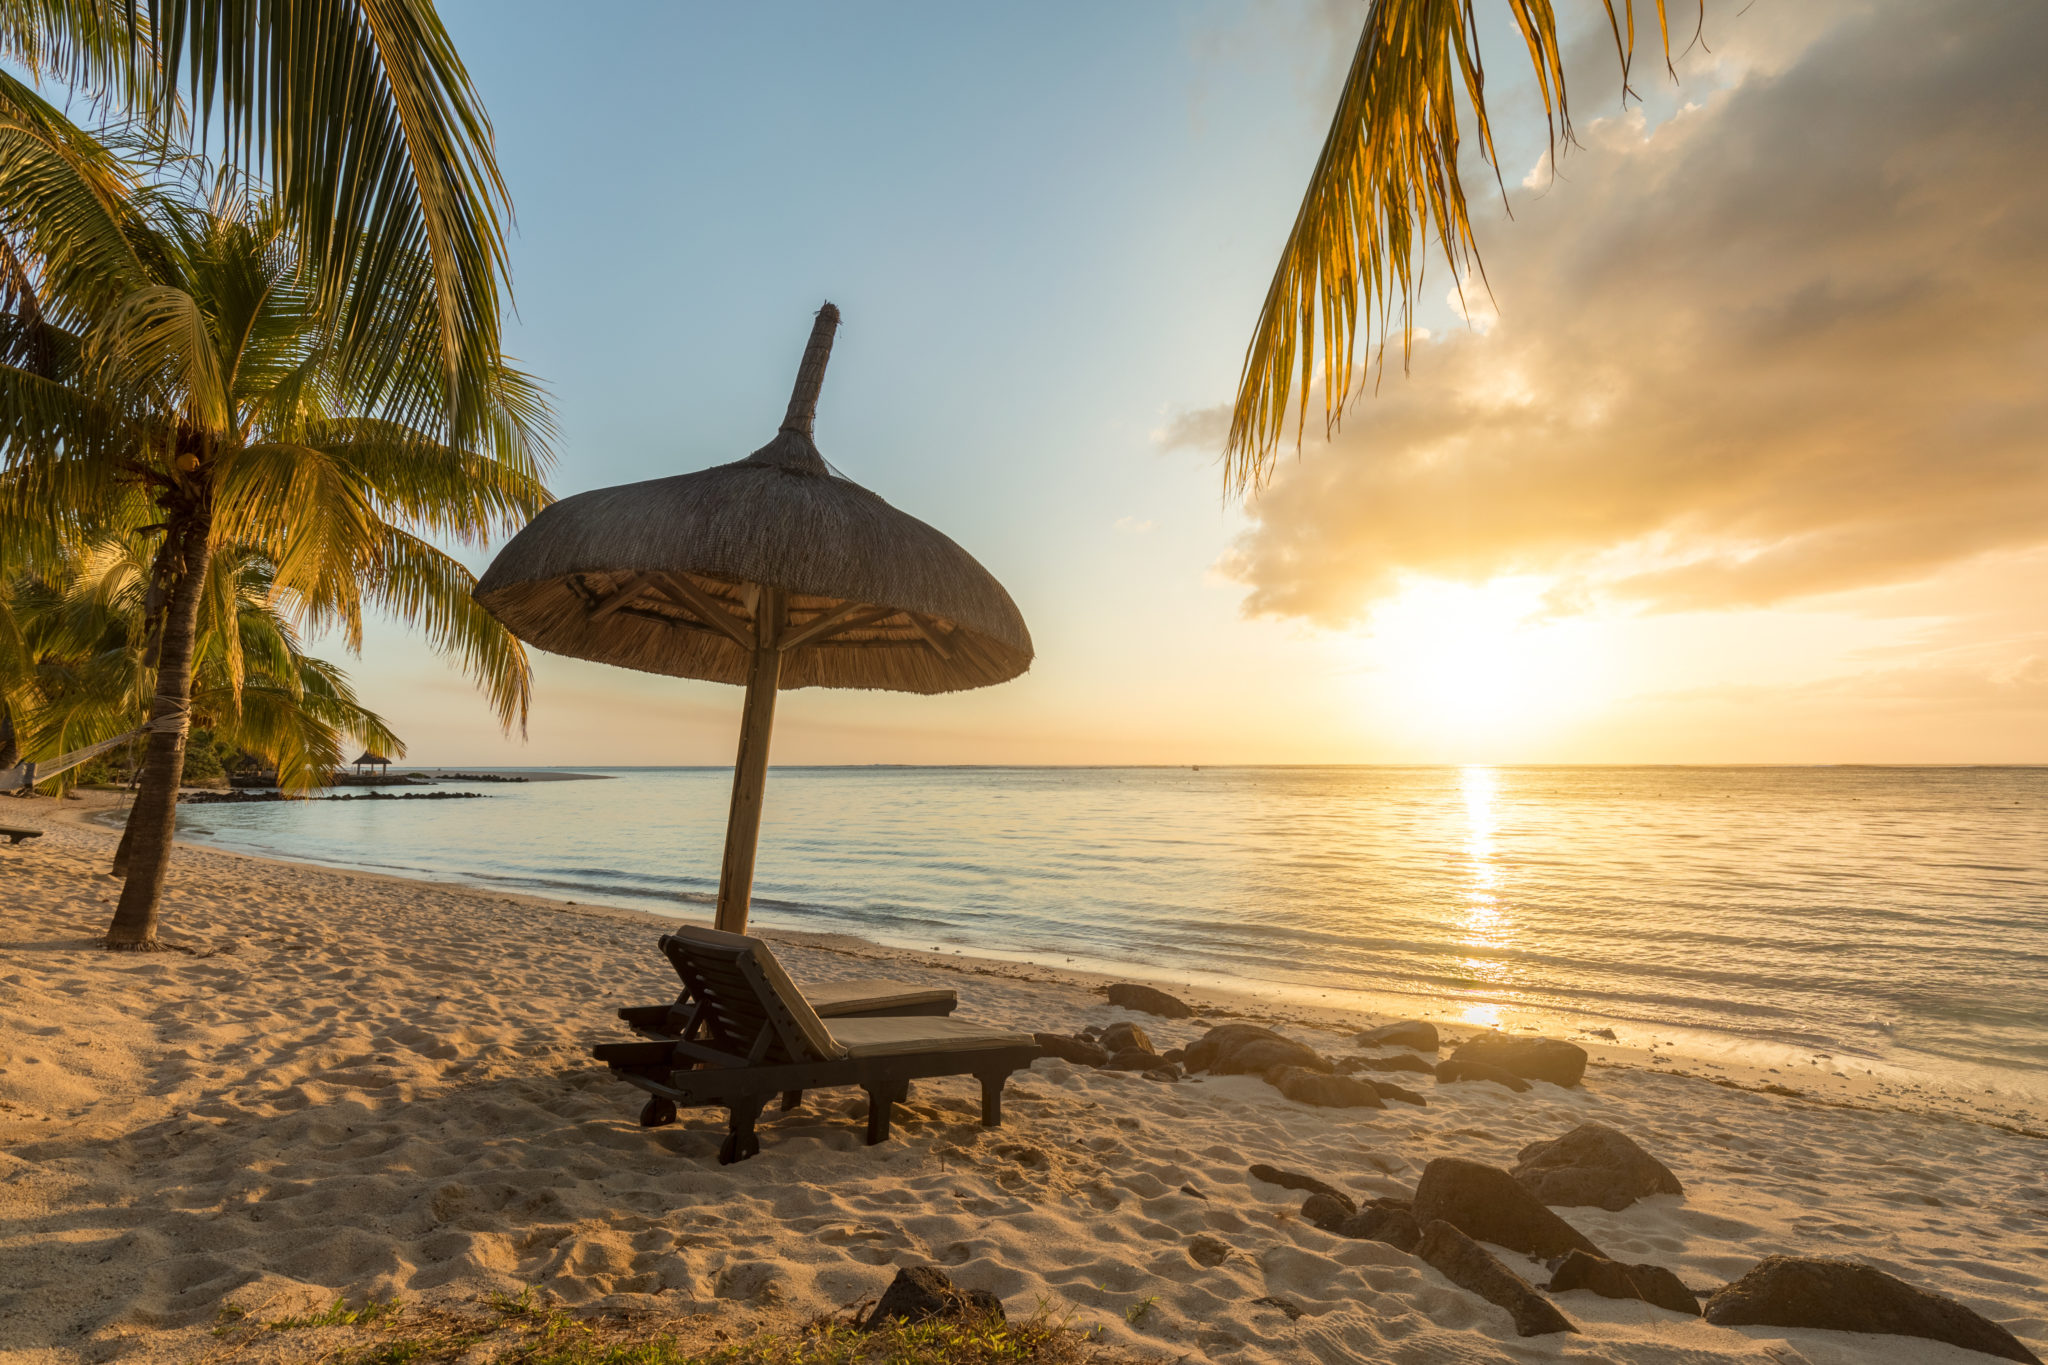 Paradisiac and Desert Island white sand Beach Palm tree at Sunset